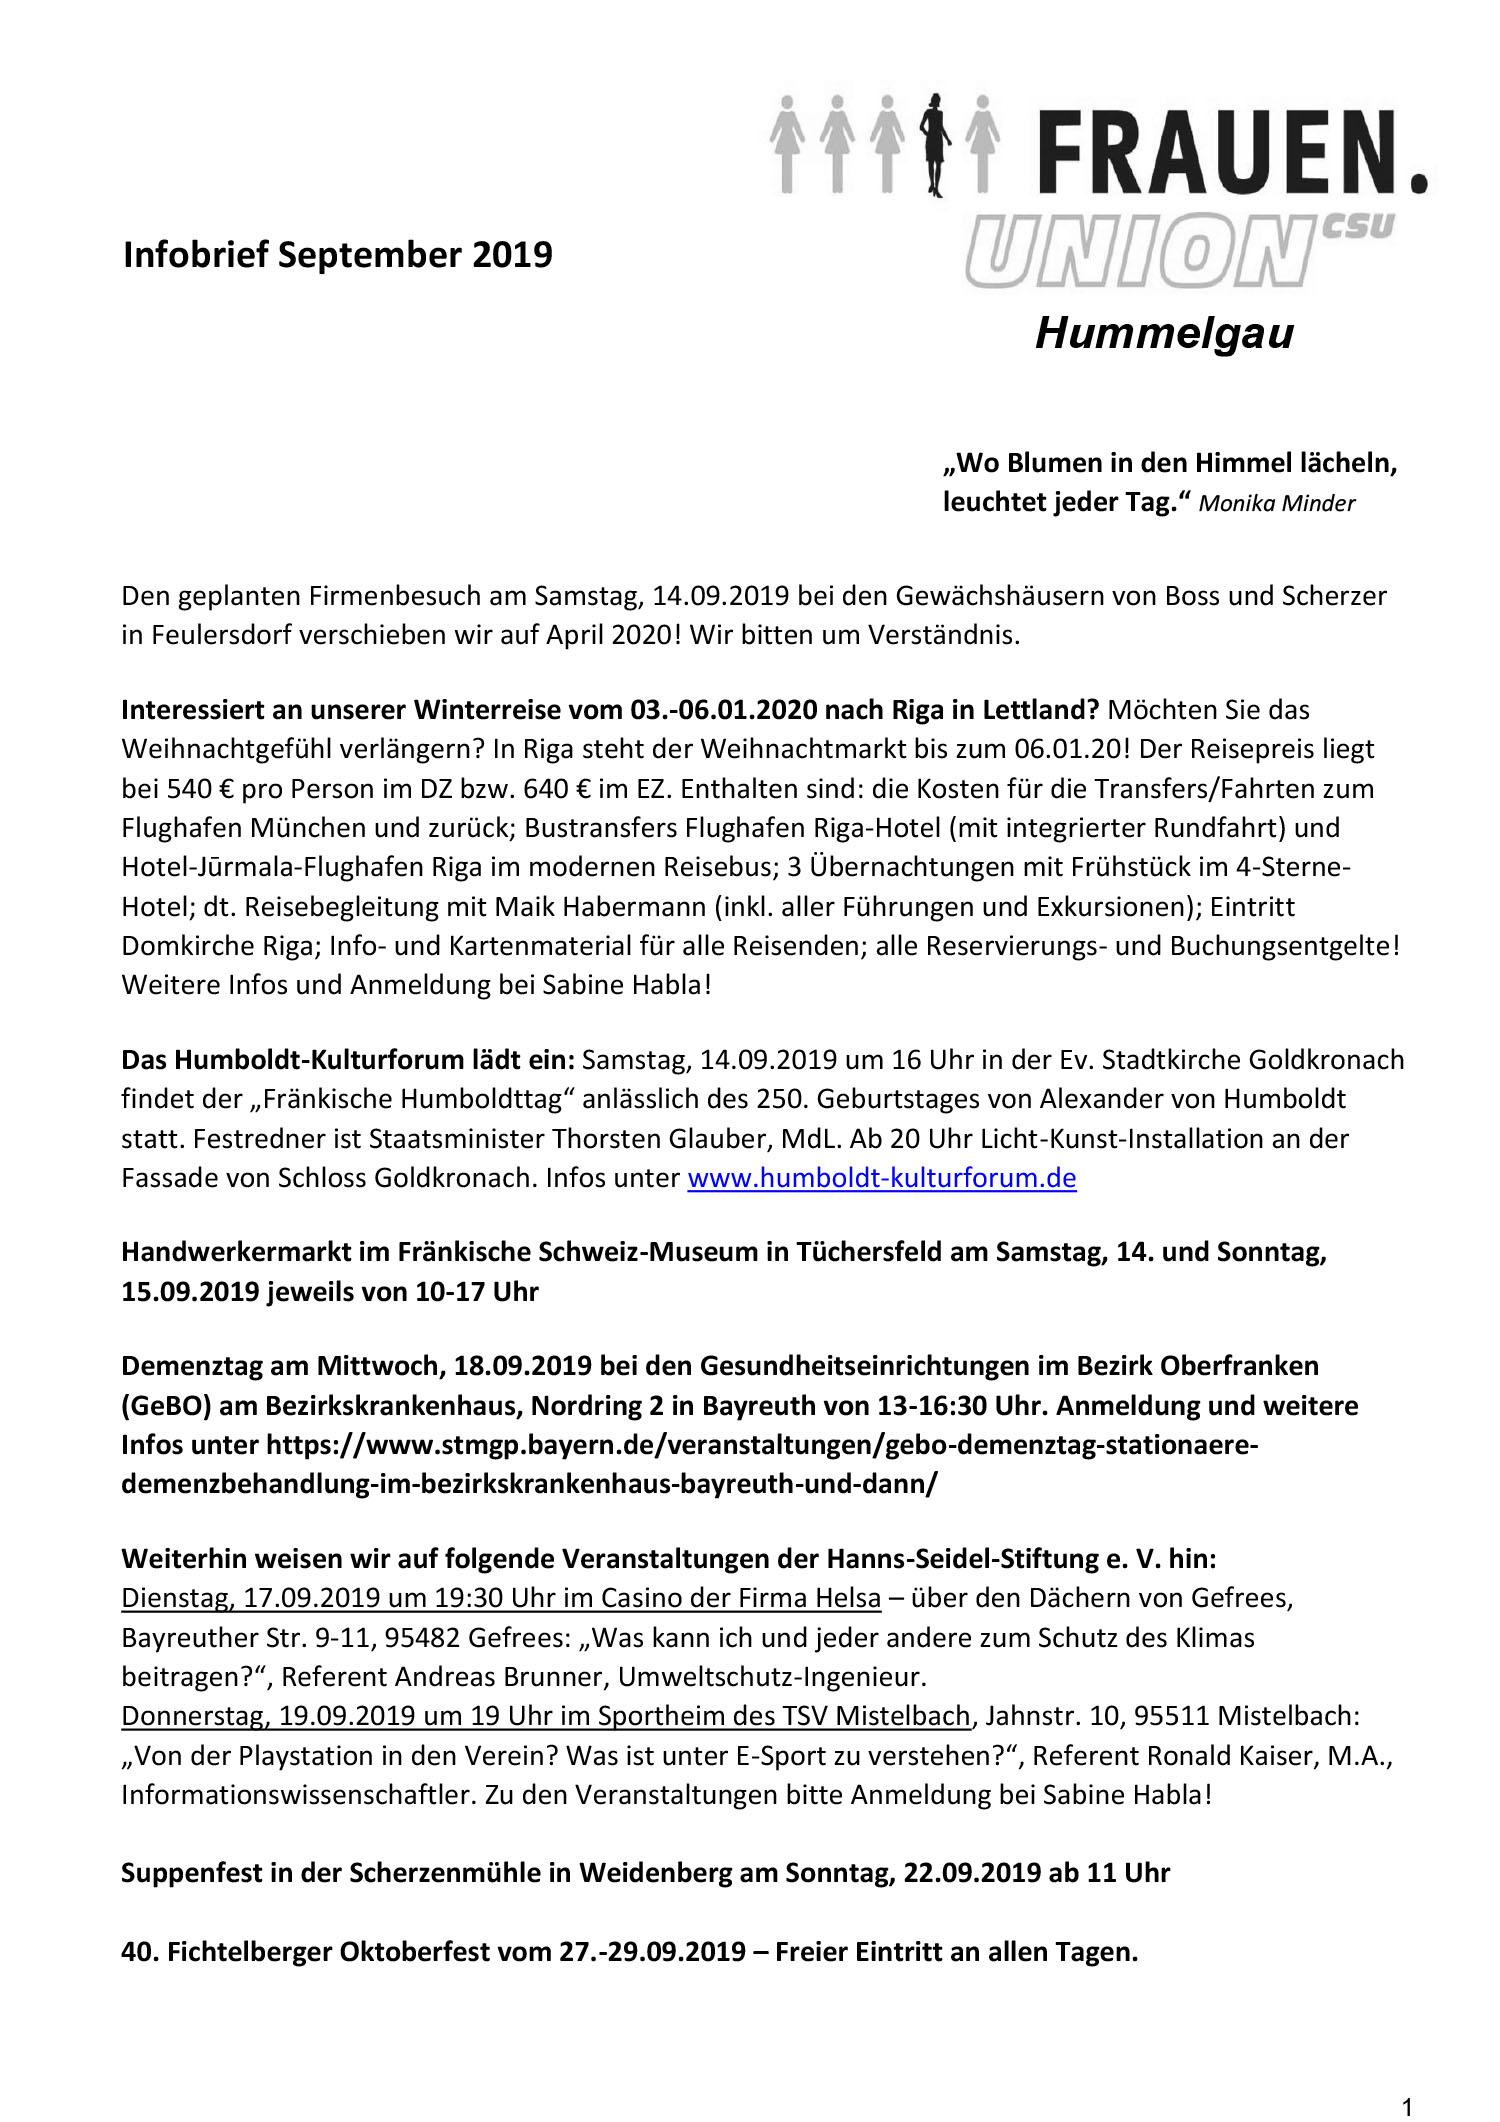 Infobrief September 2019-1